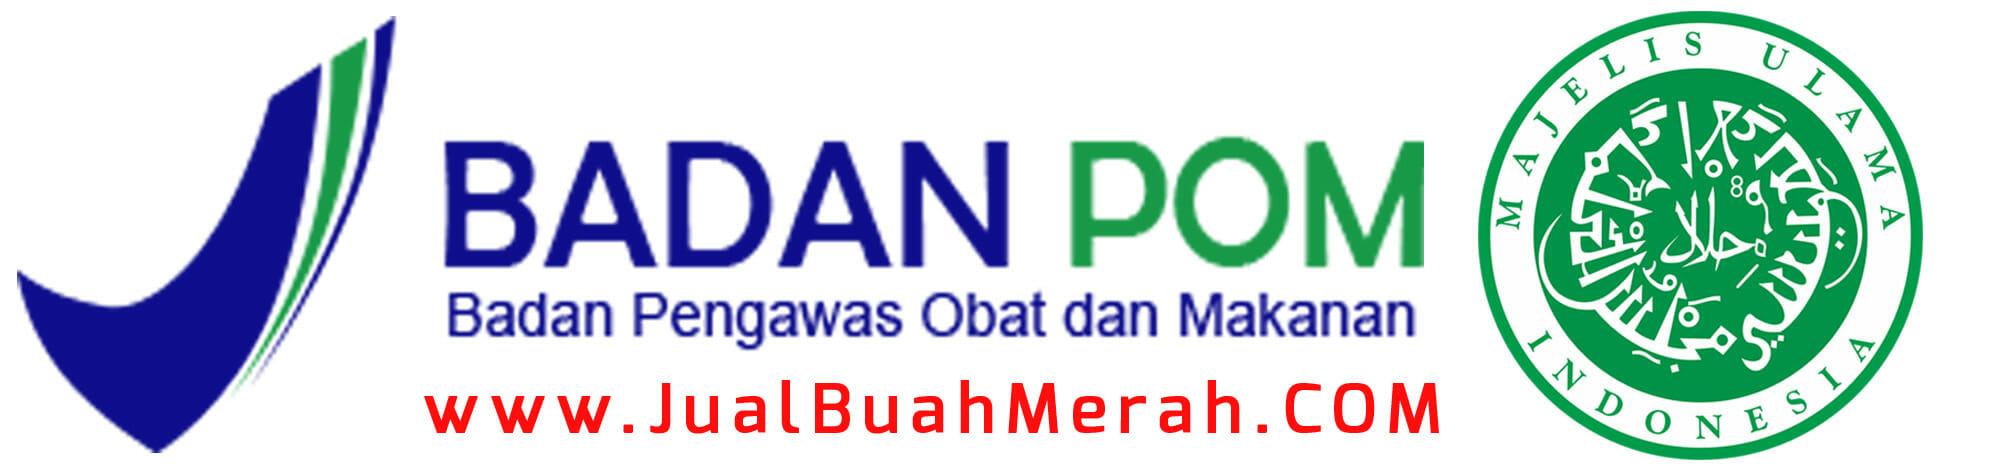 Logo MUI dan BPOM Buah Merah